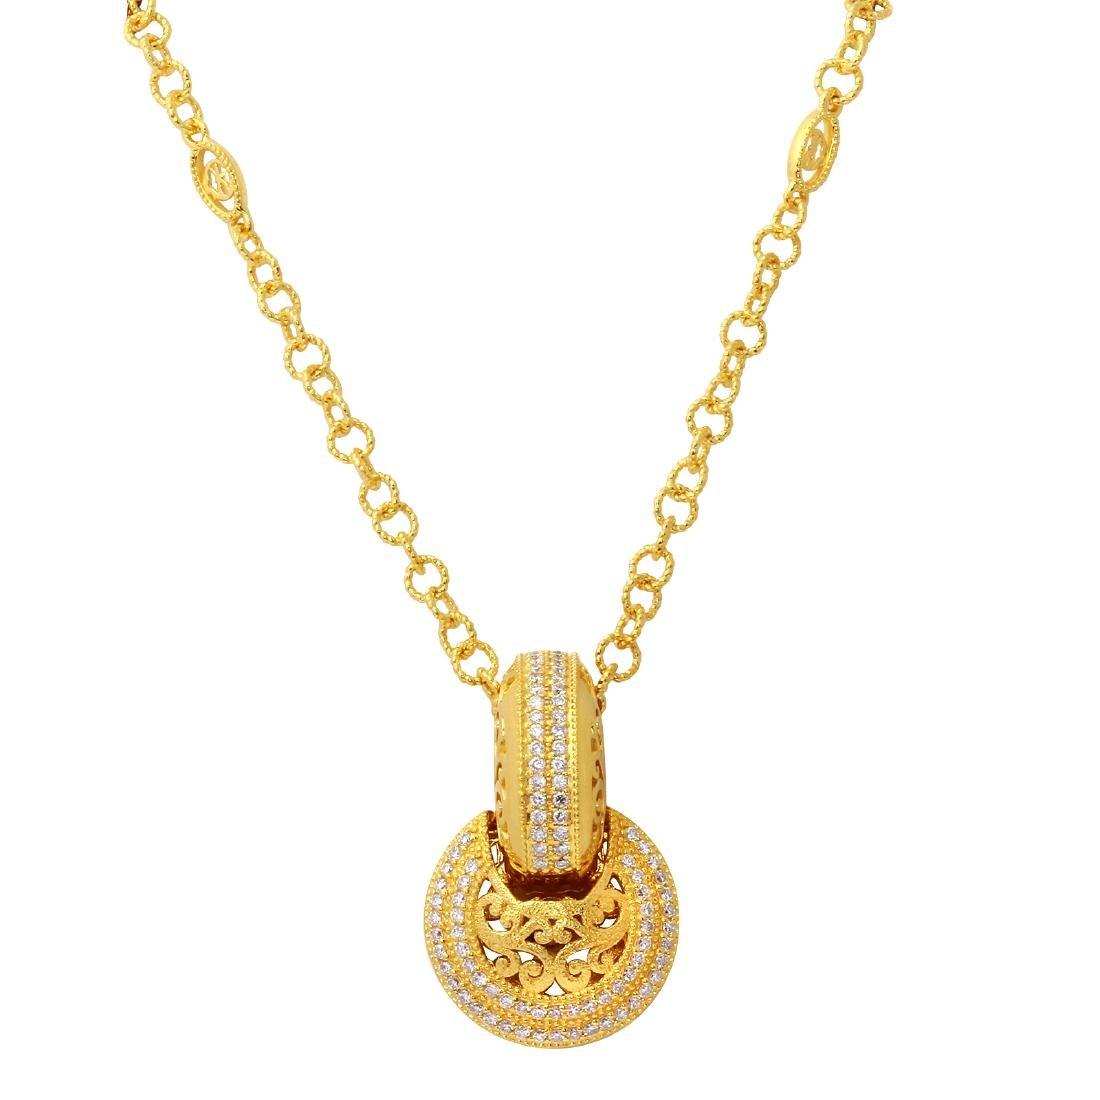 Philippe Charriol 18KT Yellow Gold Diamond Pendant &